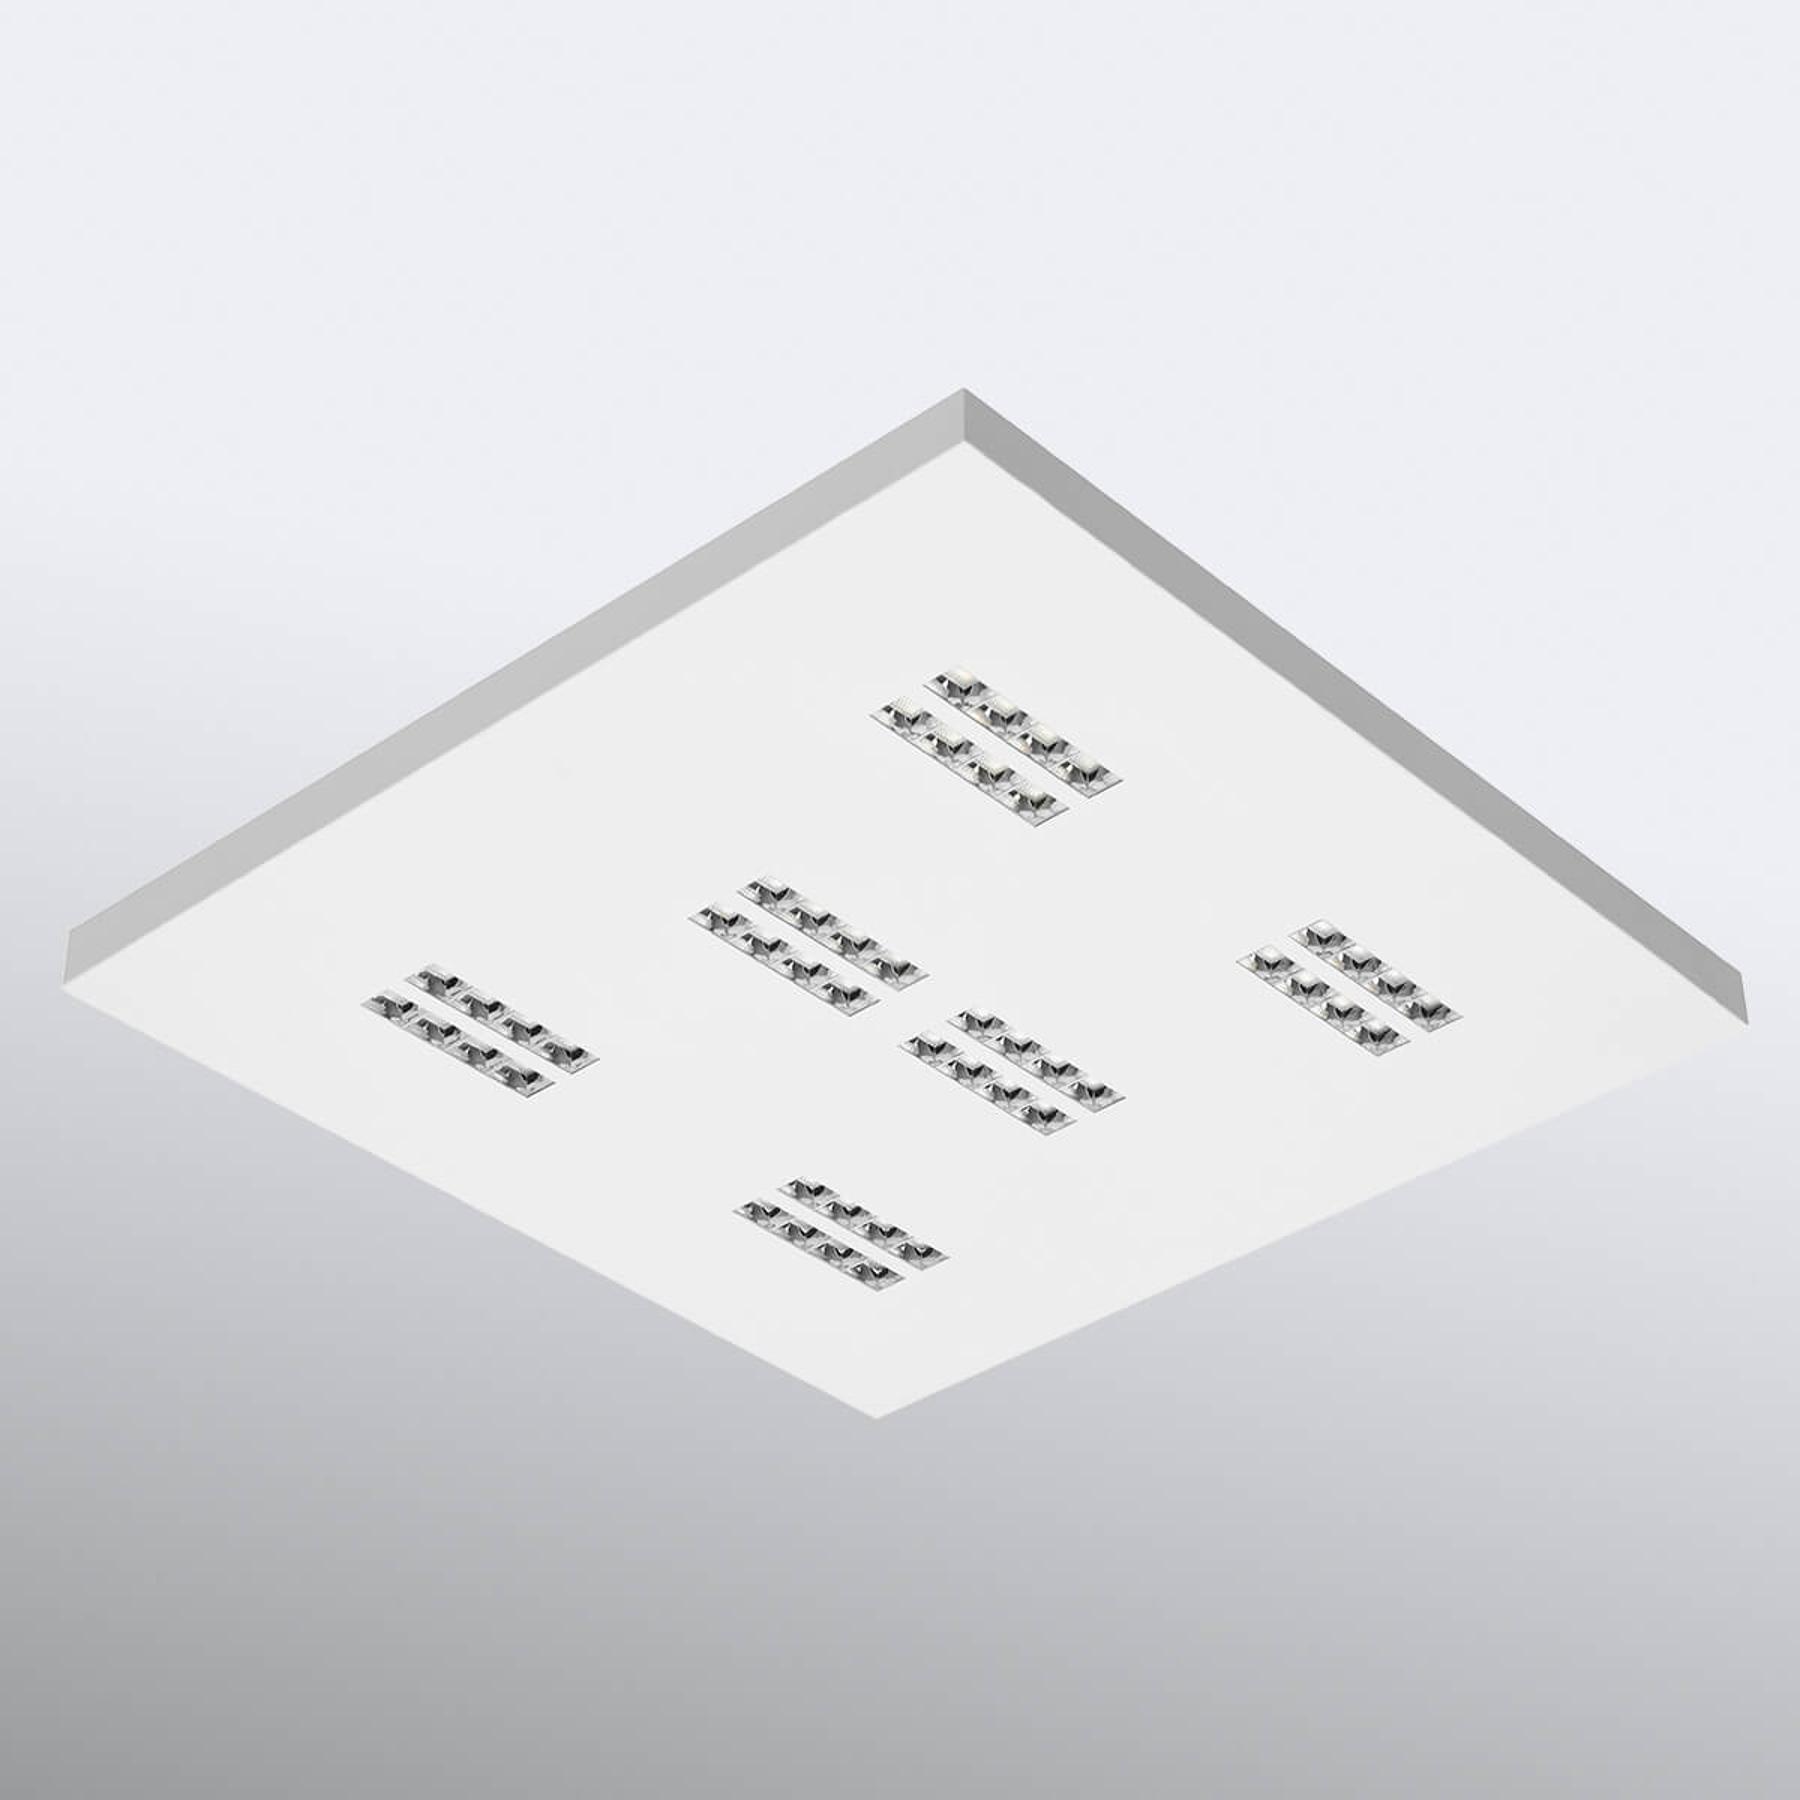 LED plafondlamp Declan II SS1 vierkant, 3.000 K